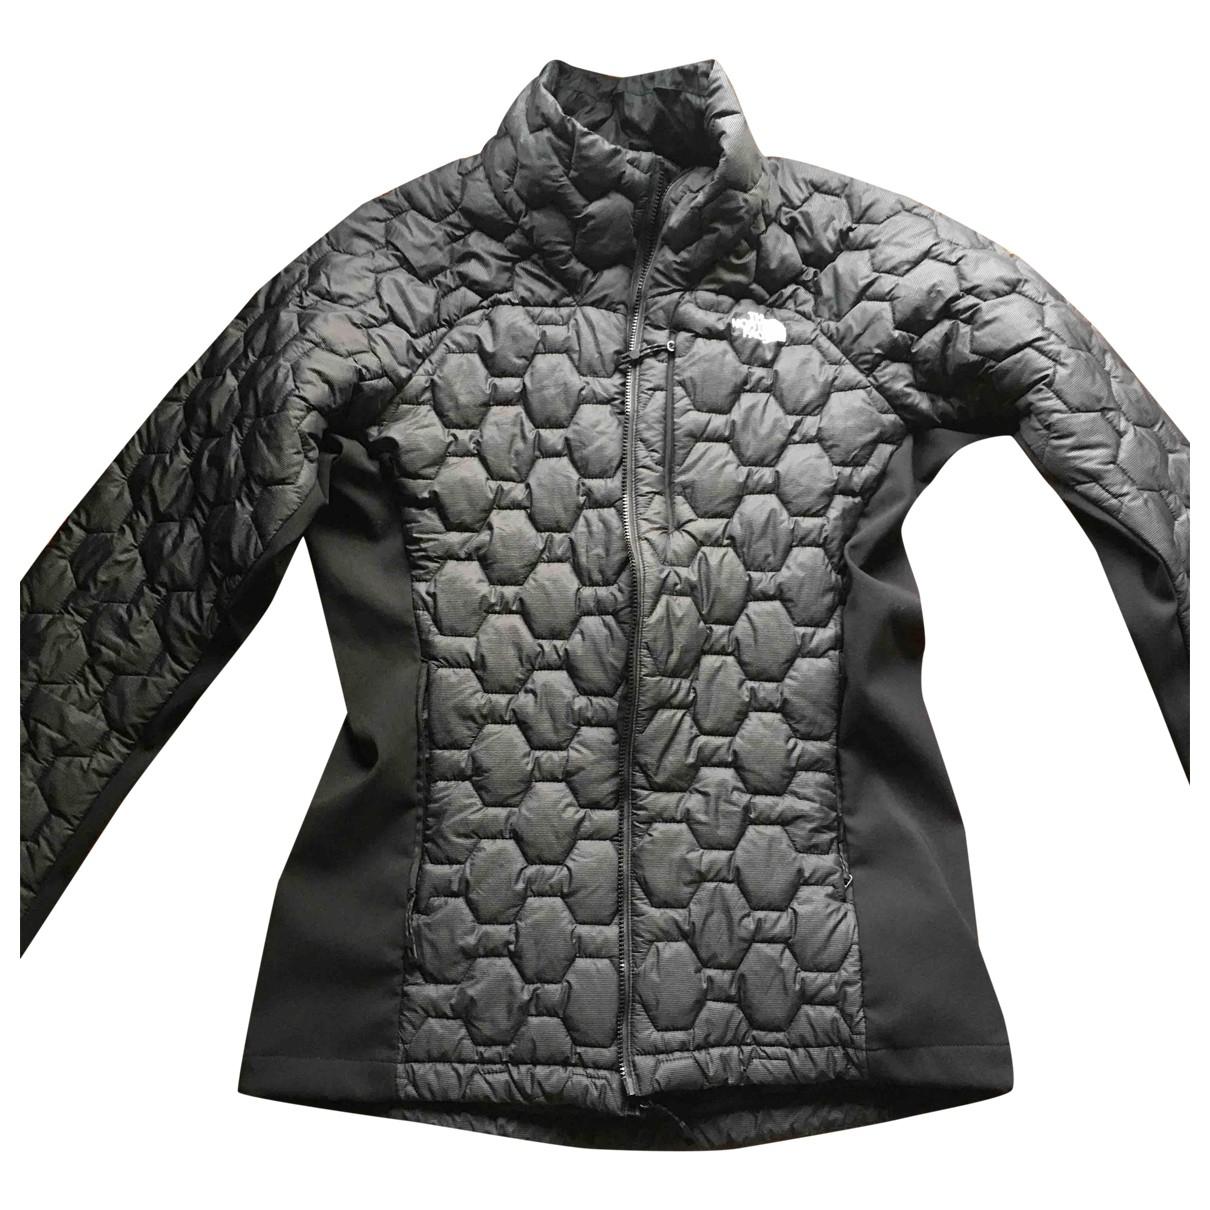 The North Face \N Black coat for Women S International